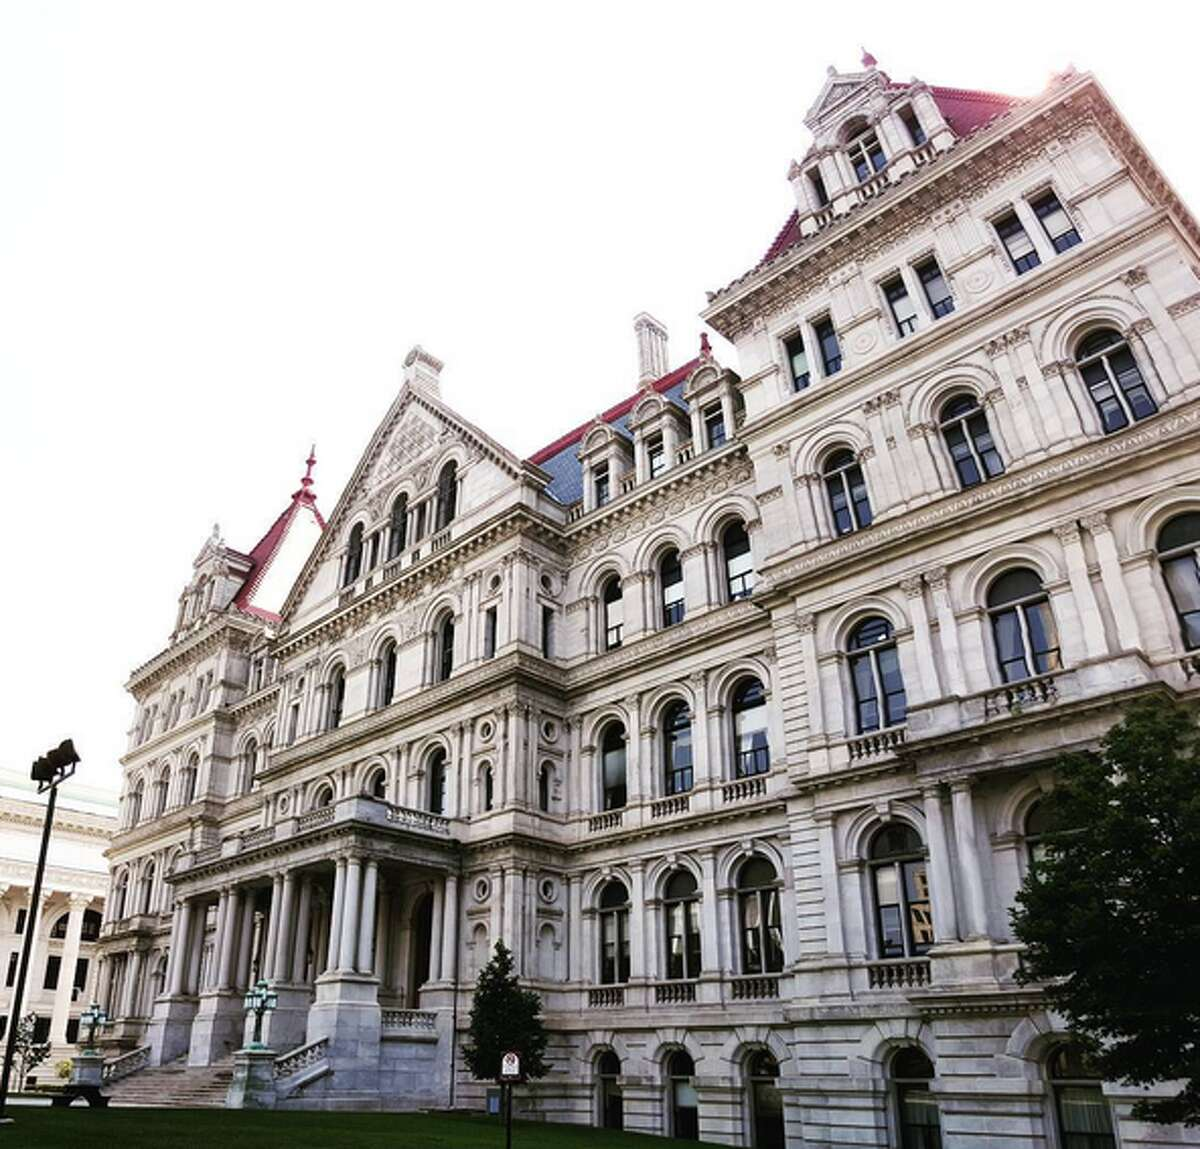 New York State Capitol. Photo credit: @elisebeth.jpg